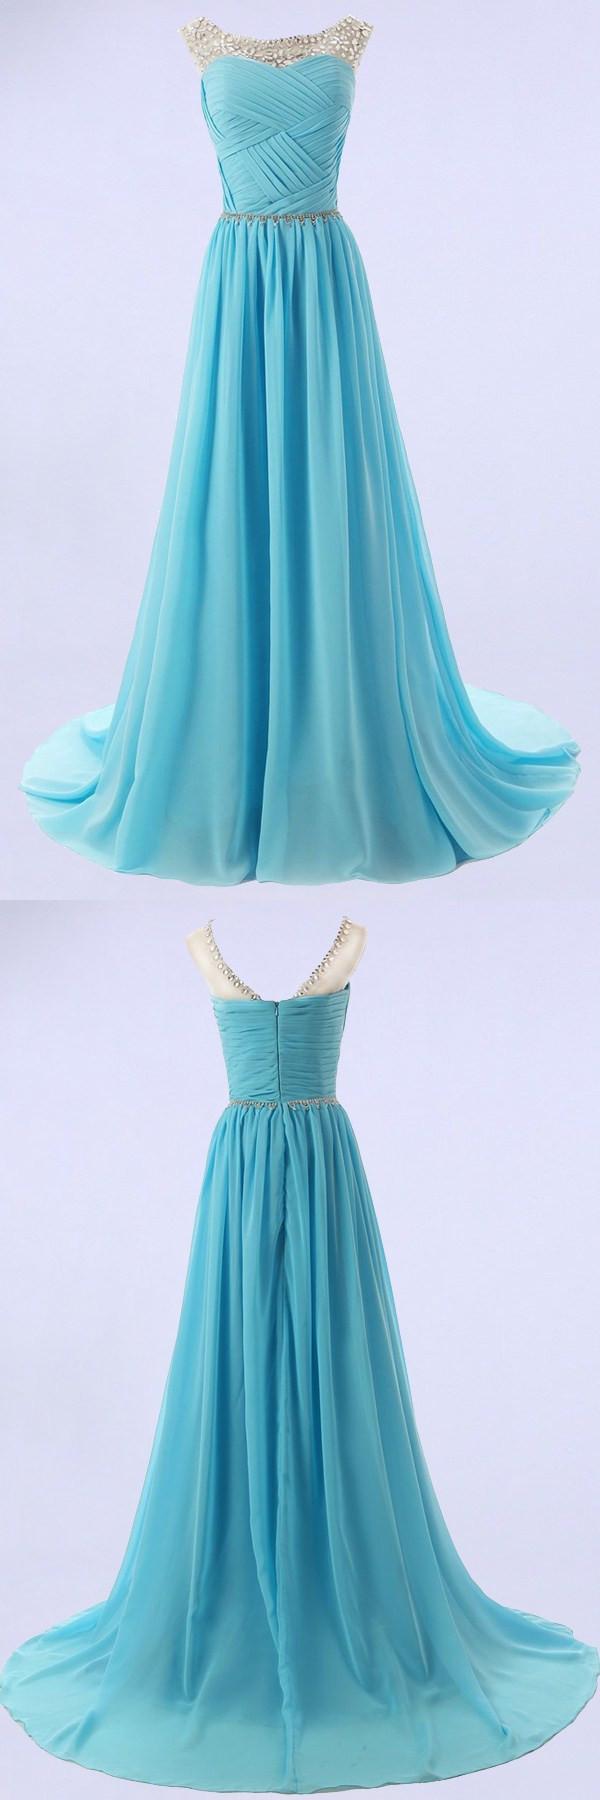 Elegant aline scoop sweeptrain bridesmaidpromhomecoming dress